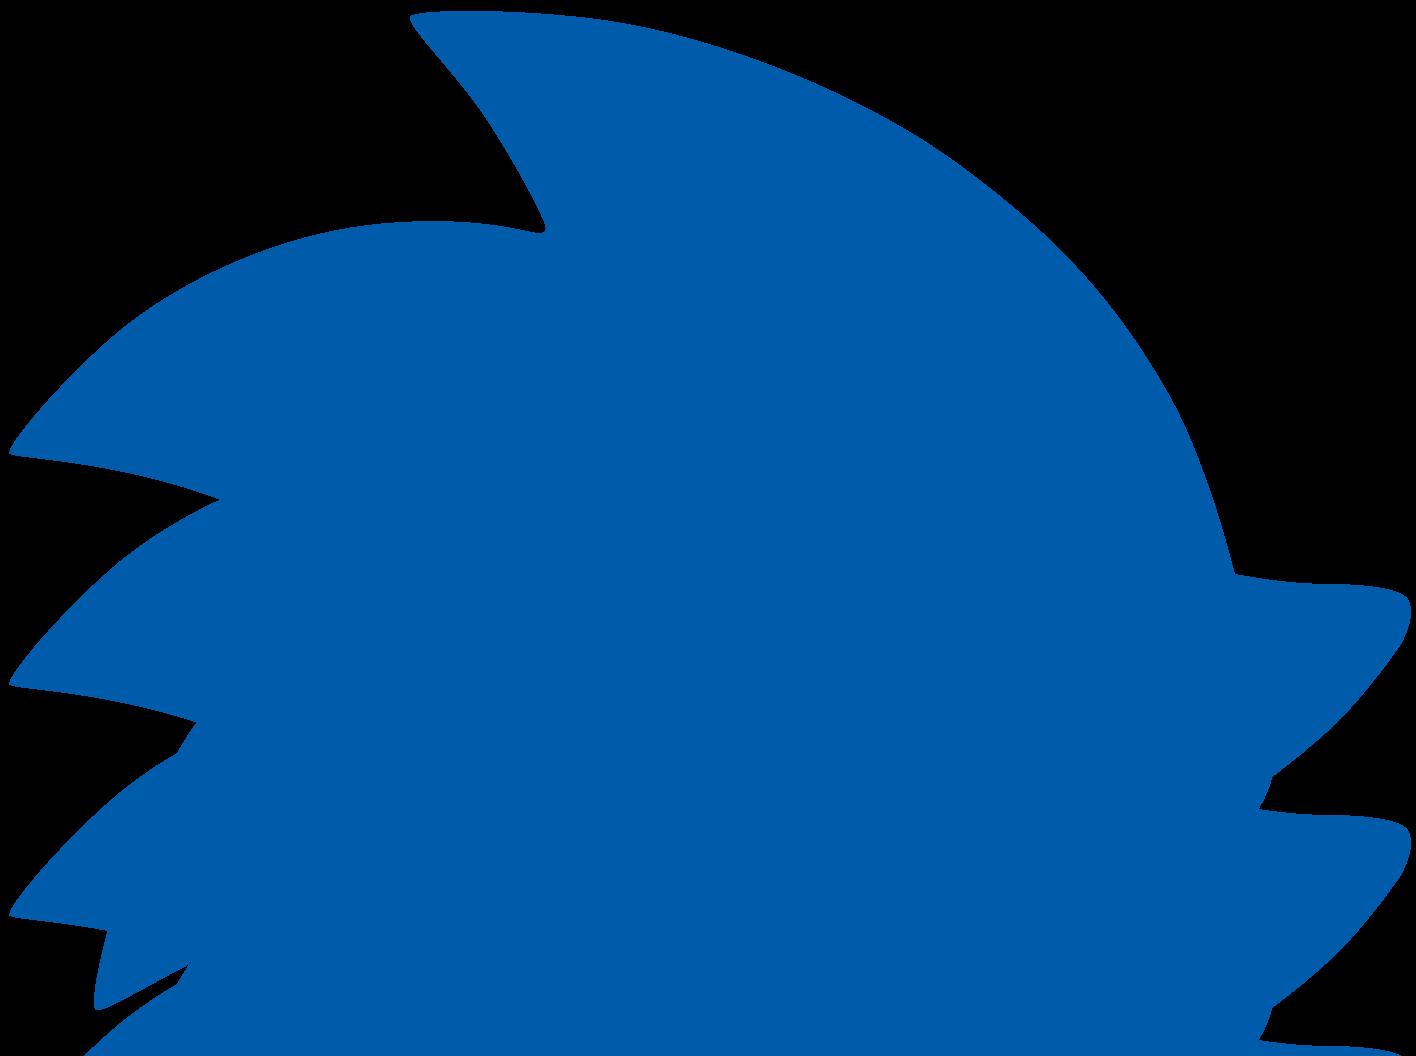 Sonic Head Logos